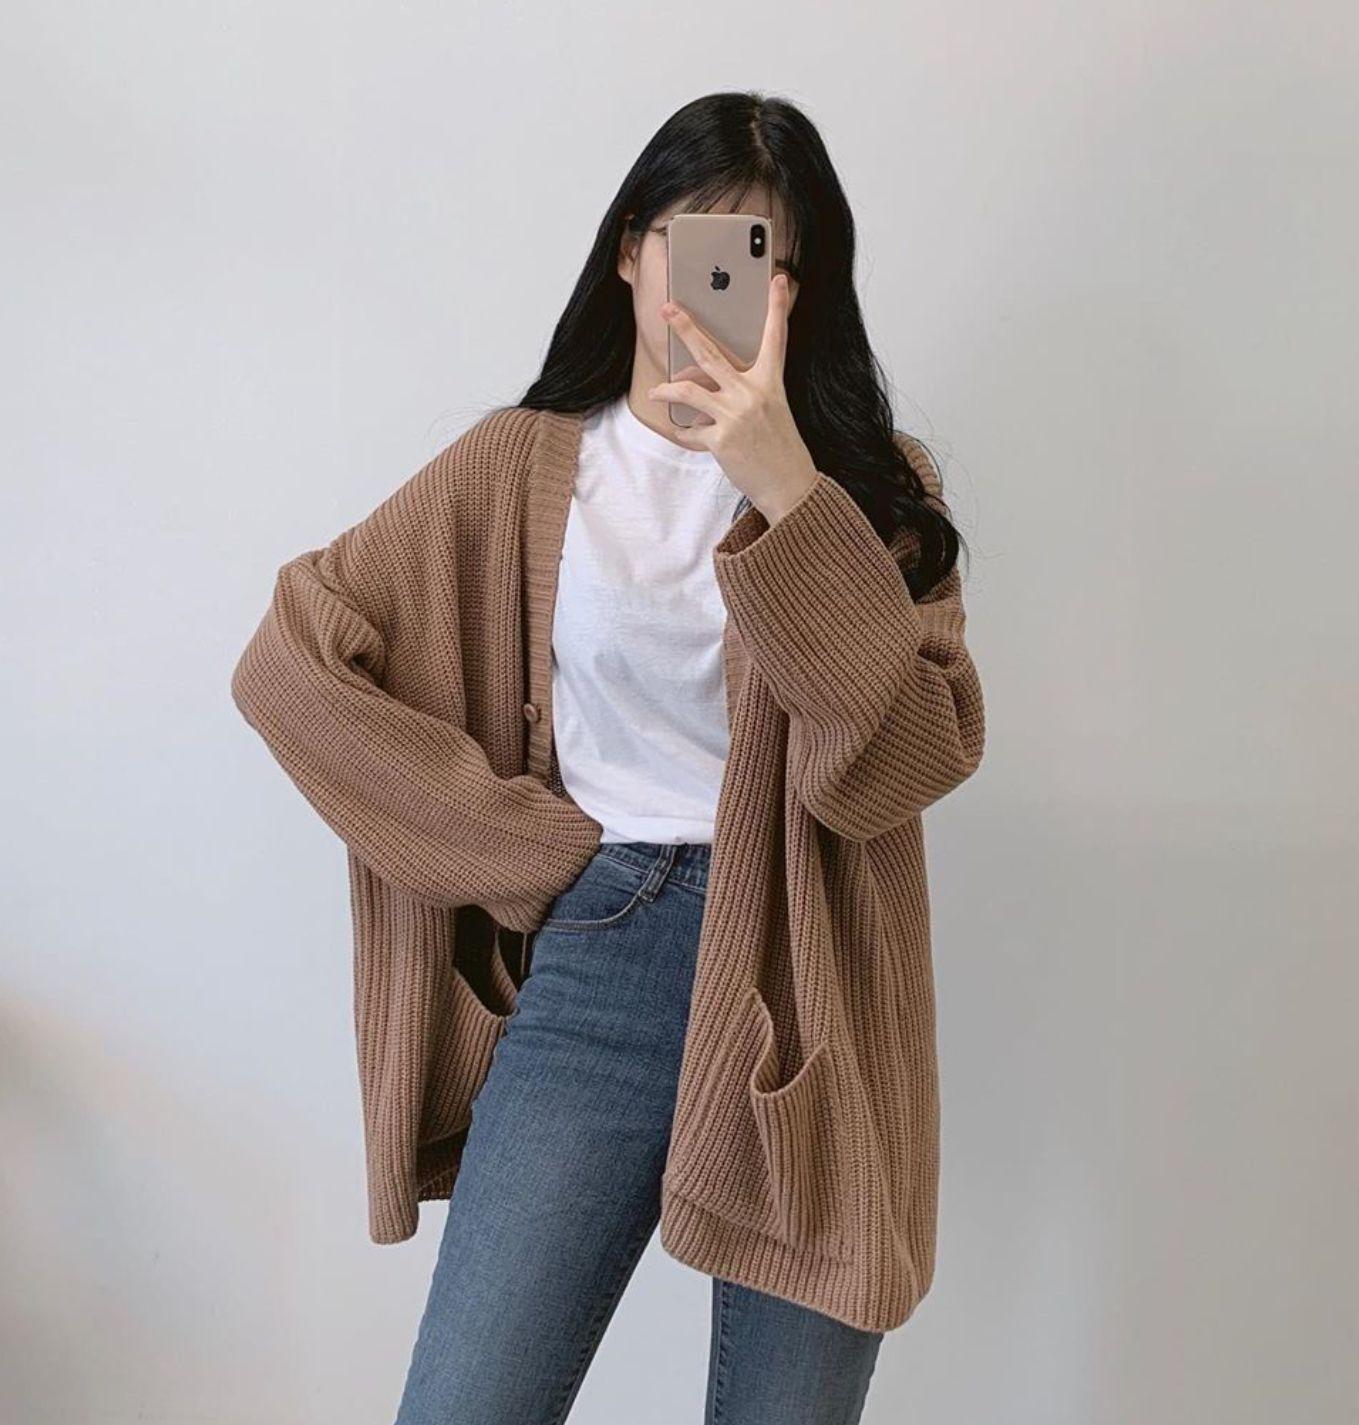 R O S I E In 2020 Korean Girl Fashion Ulzzang Fashion Fashion Inspo Outfits